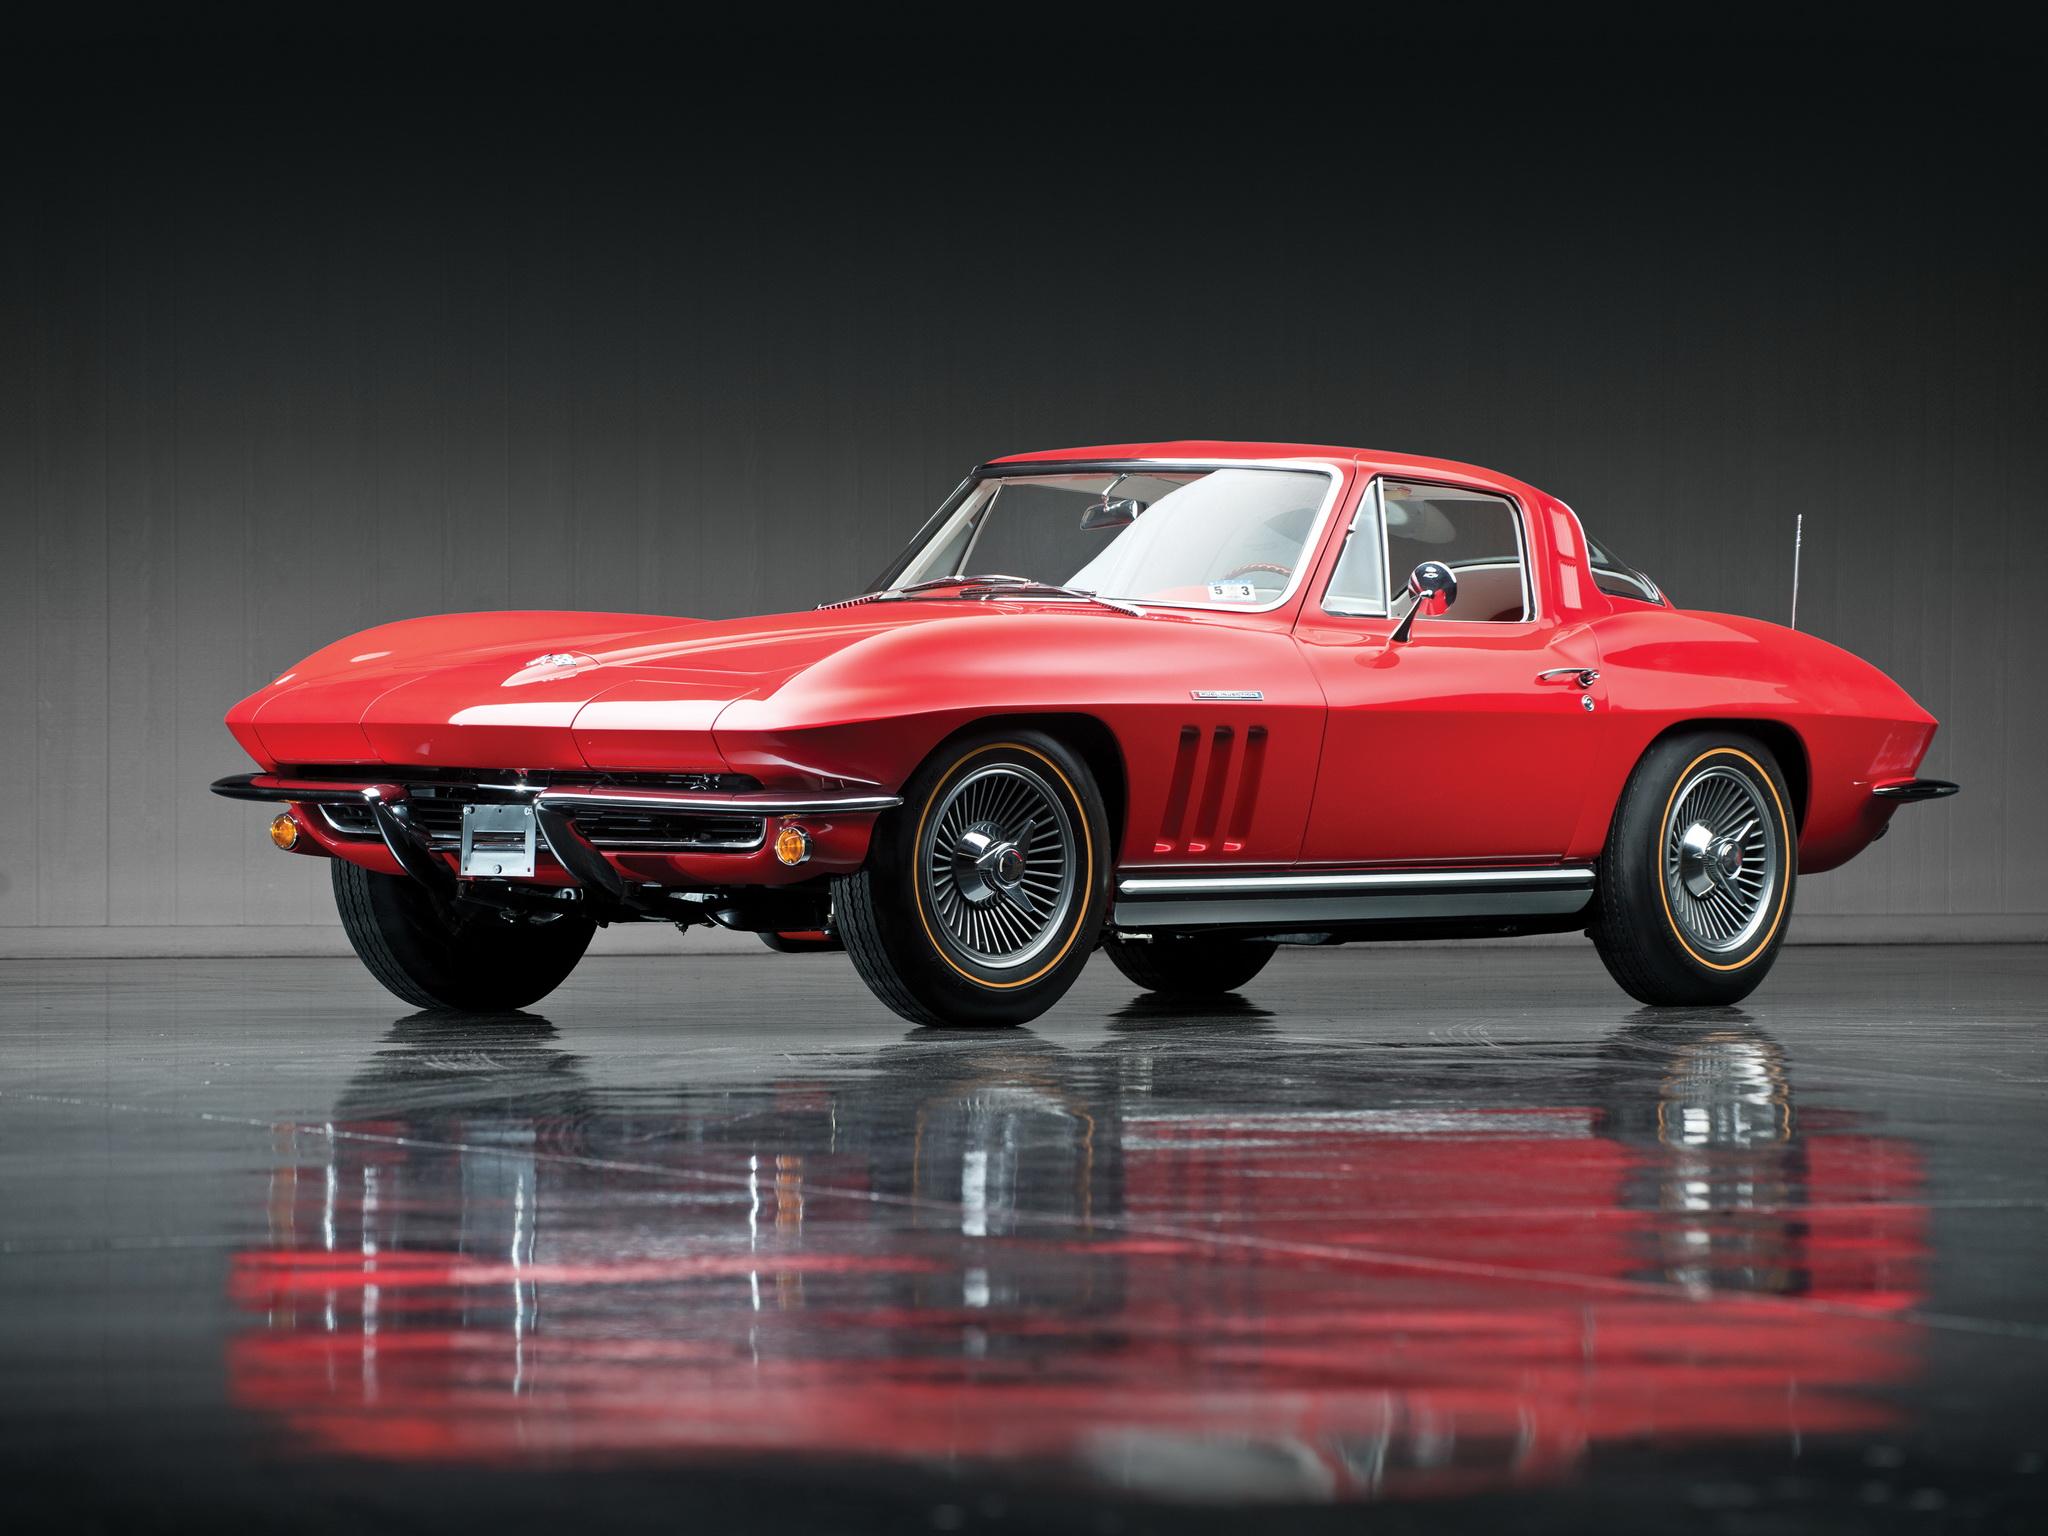 1965 corvette wallpaper - photo #17